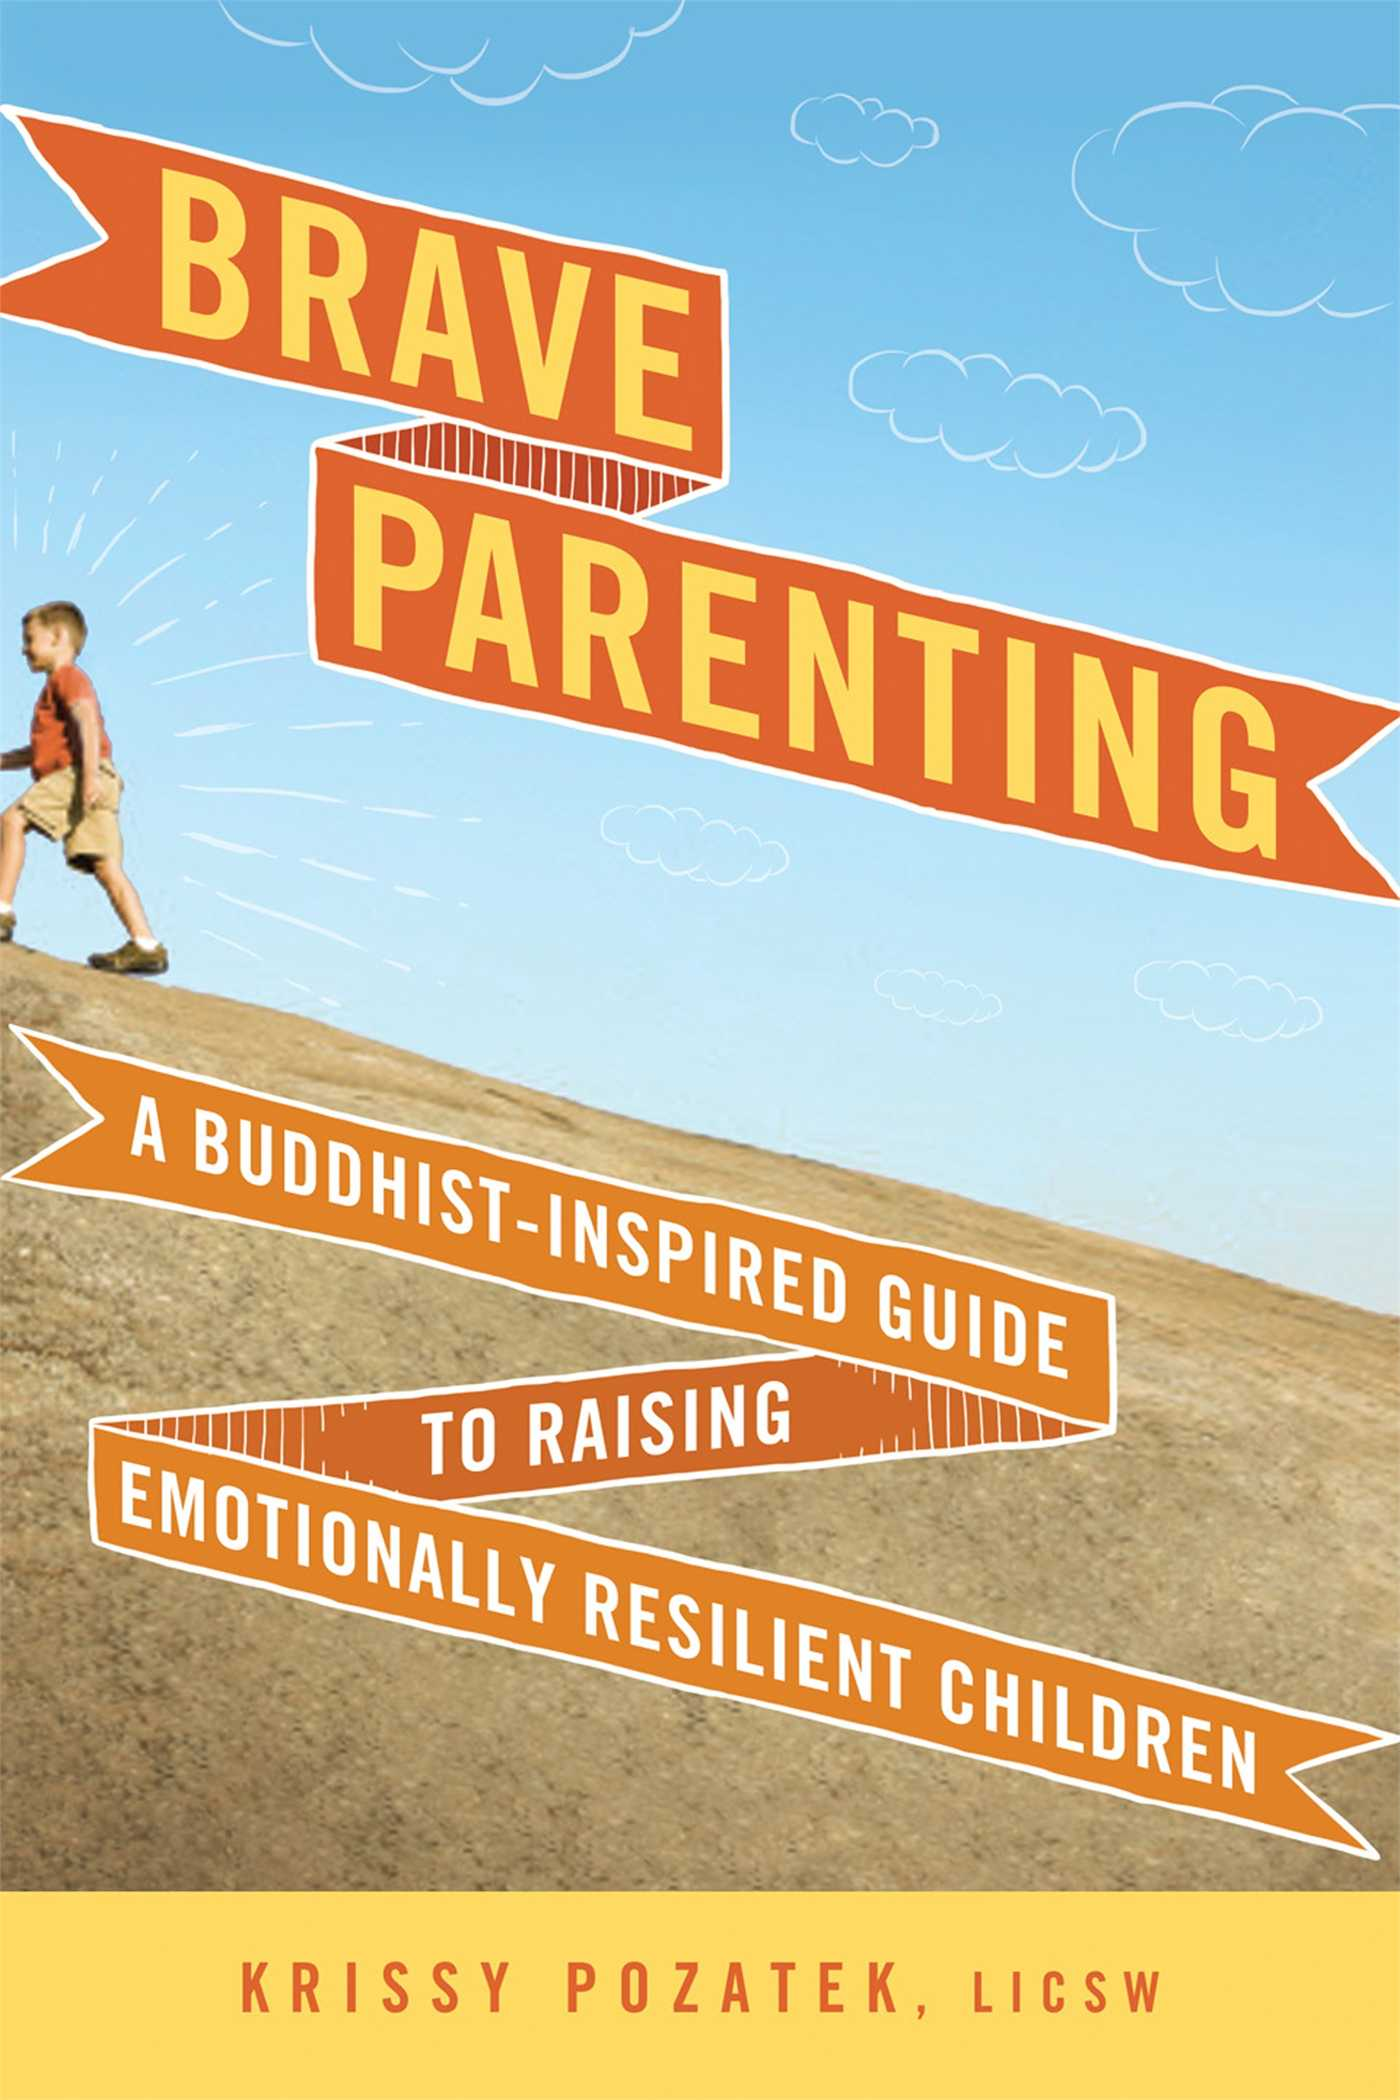 Brave parenting 9781614290896 hr